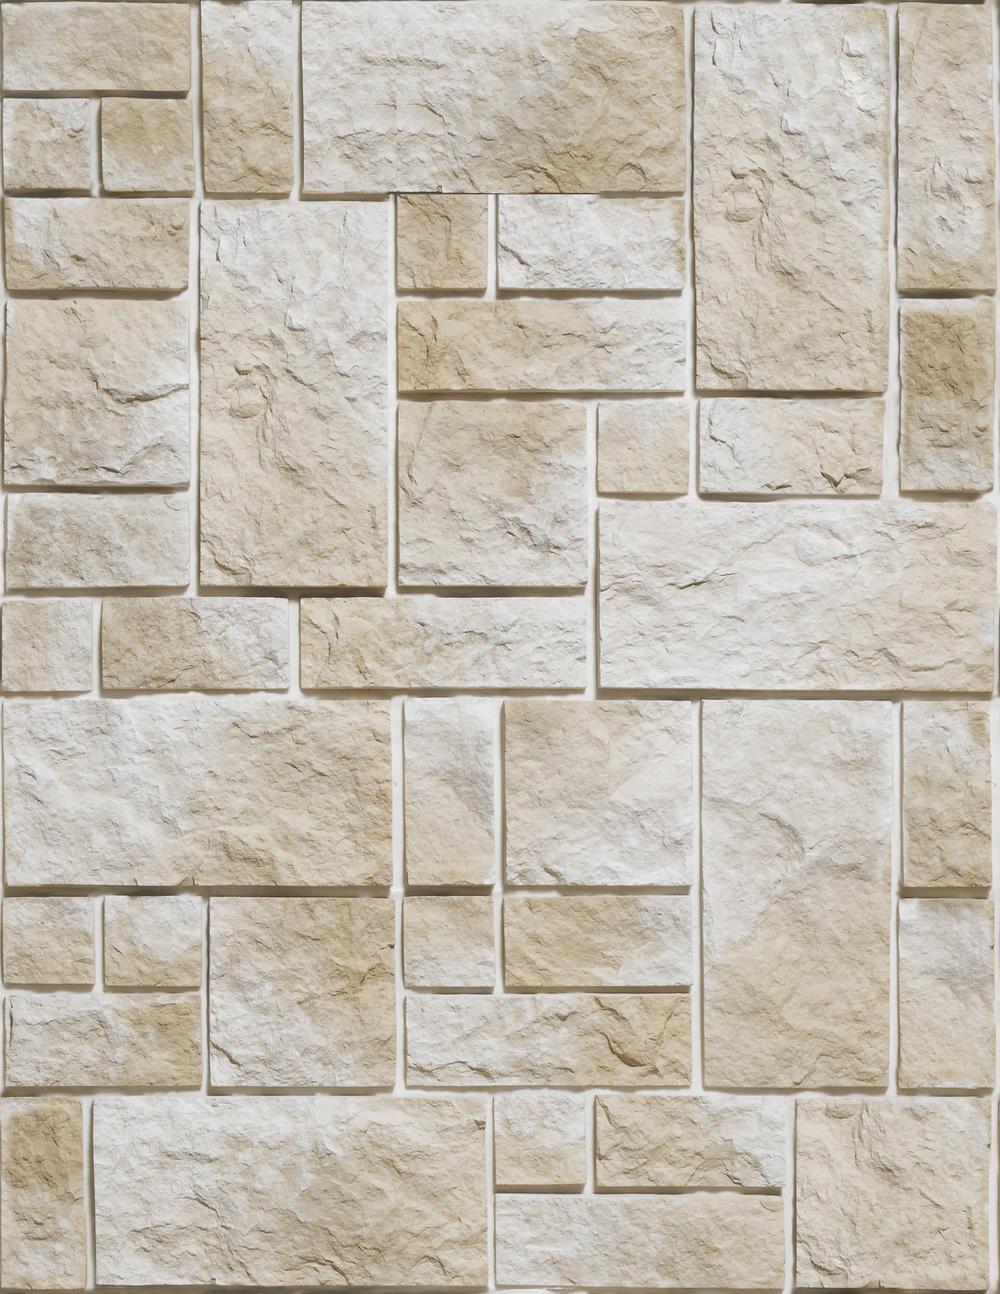 stone_texture940.jpg